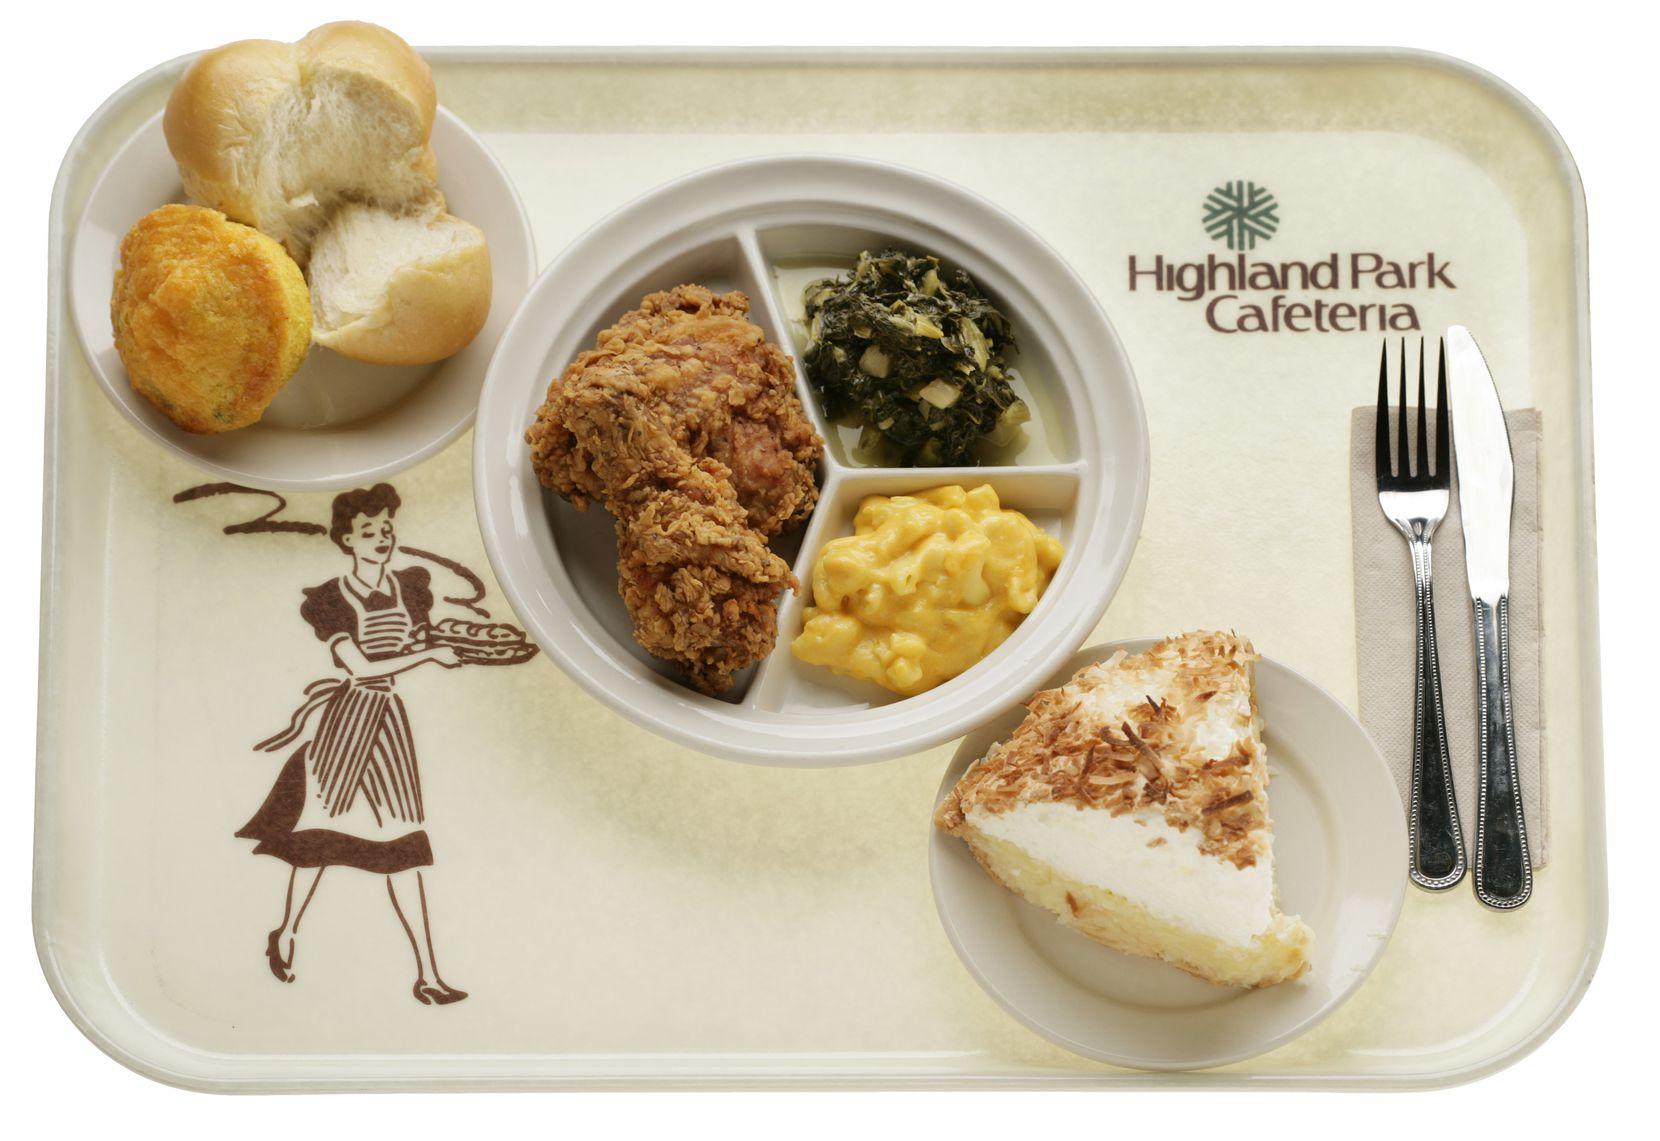 Highland Park Cafeteria tray